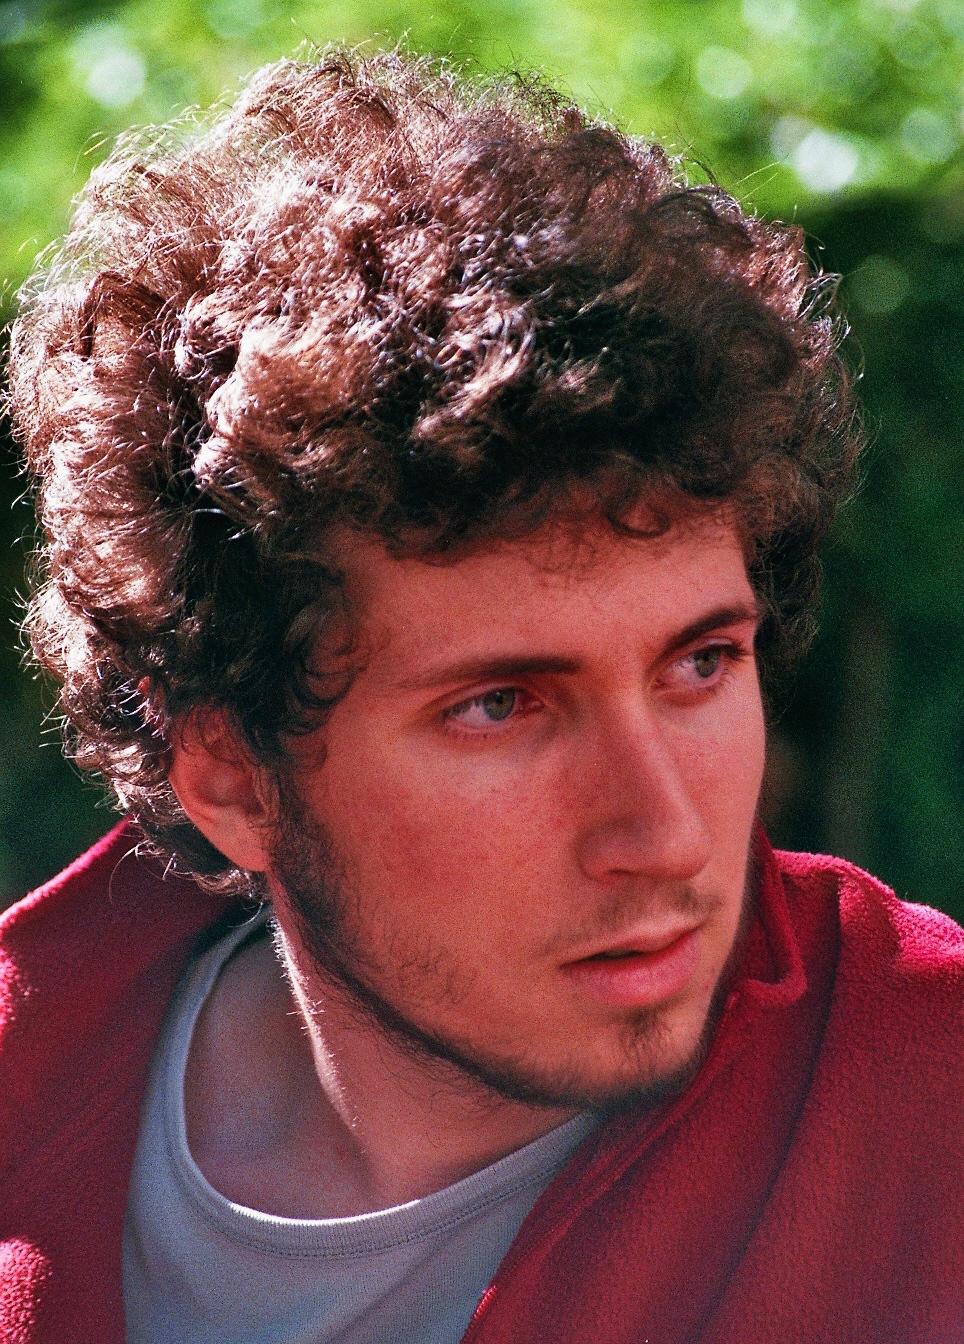 Corentin Boissier, 18 years old